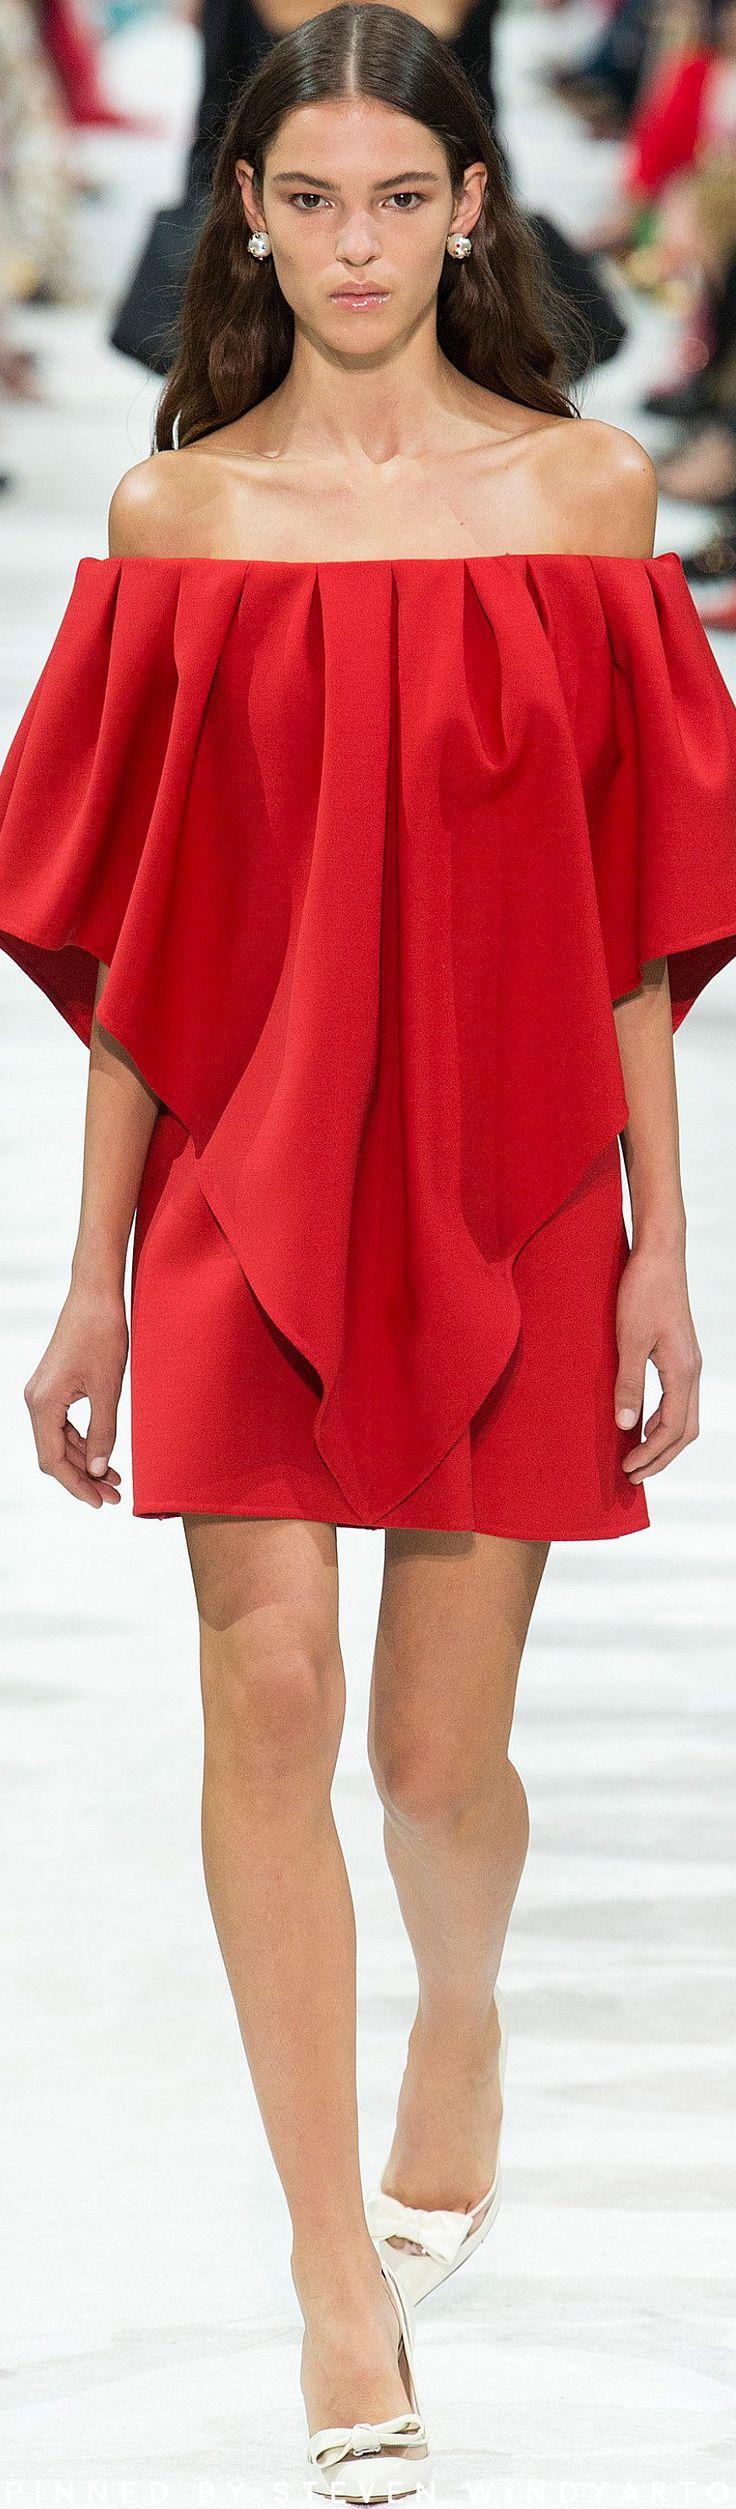 Valentino Spring 2018 Fashion Show #spring2018 #ss18 #womenswear